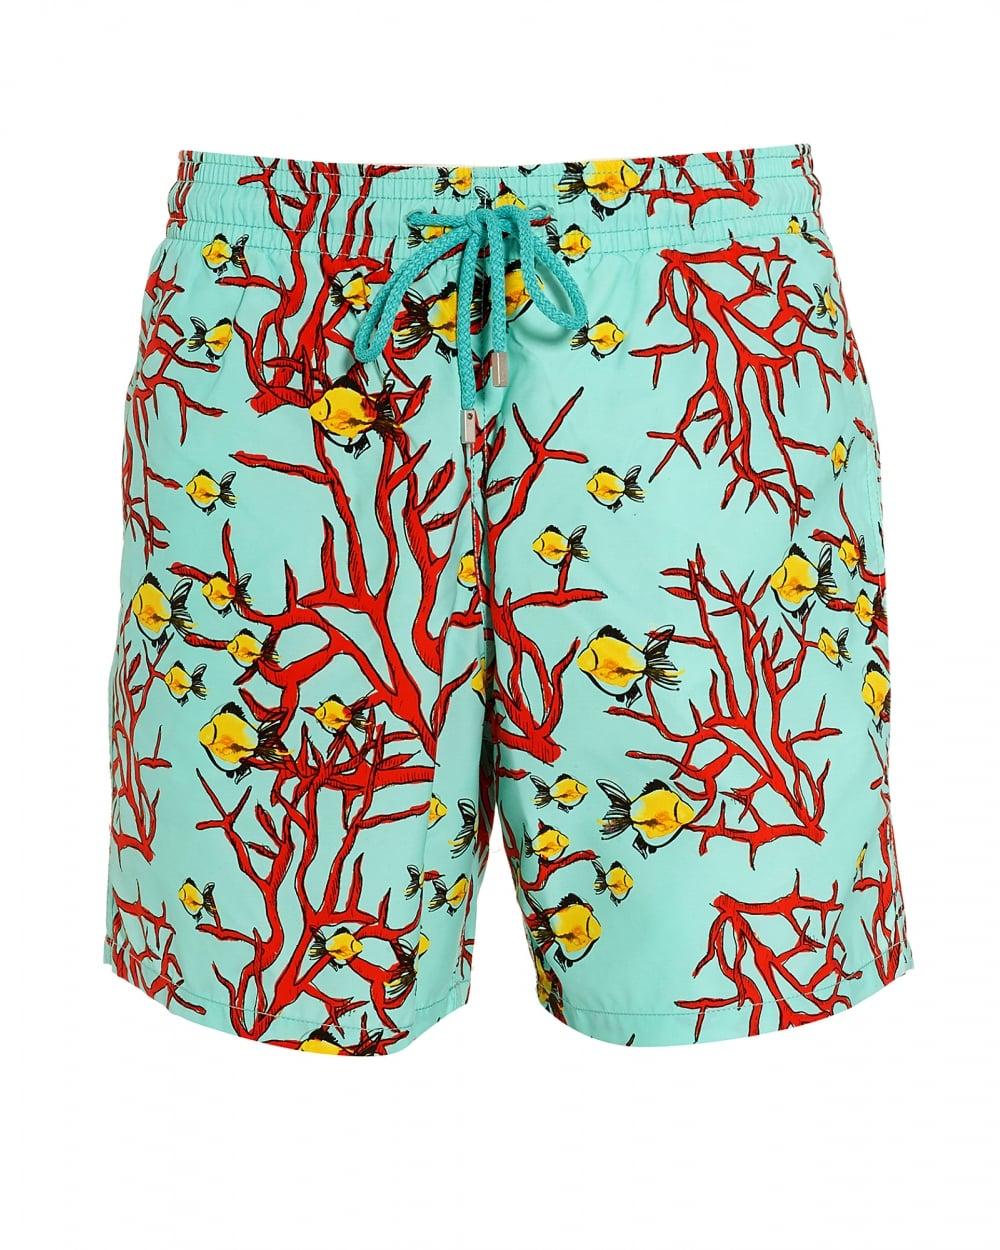 7e2f9bc97b Mens Moorea Swim Shorts, Lagoon Blue Coral Fish Swimming Trunks